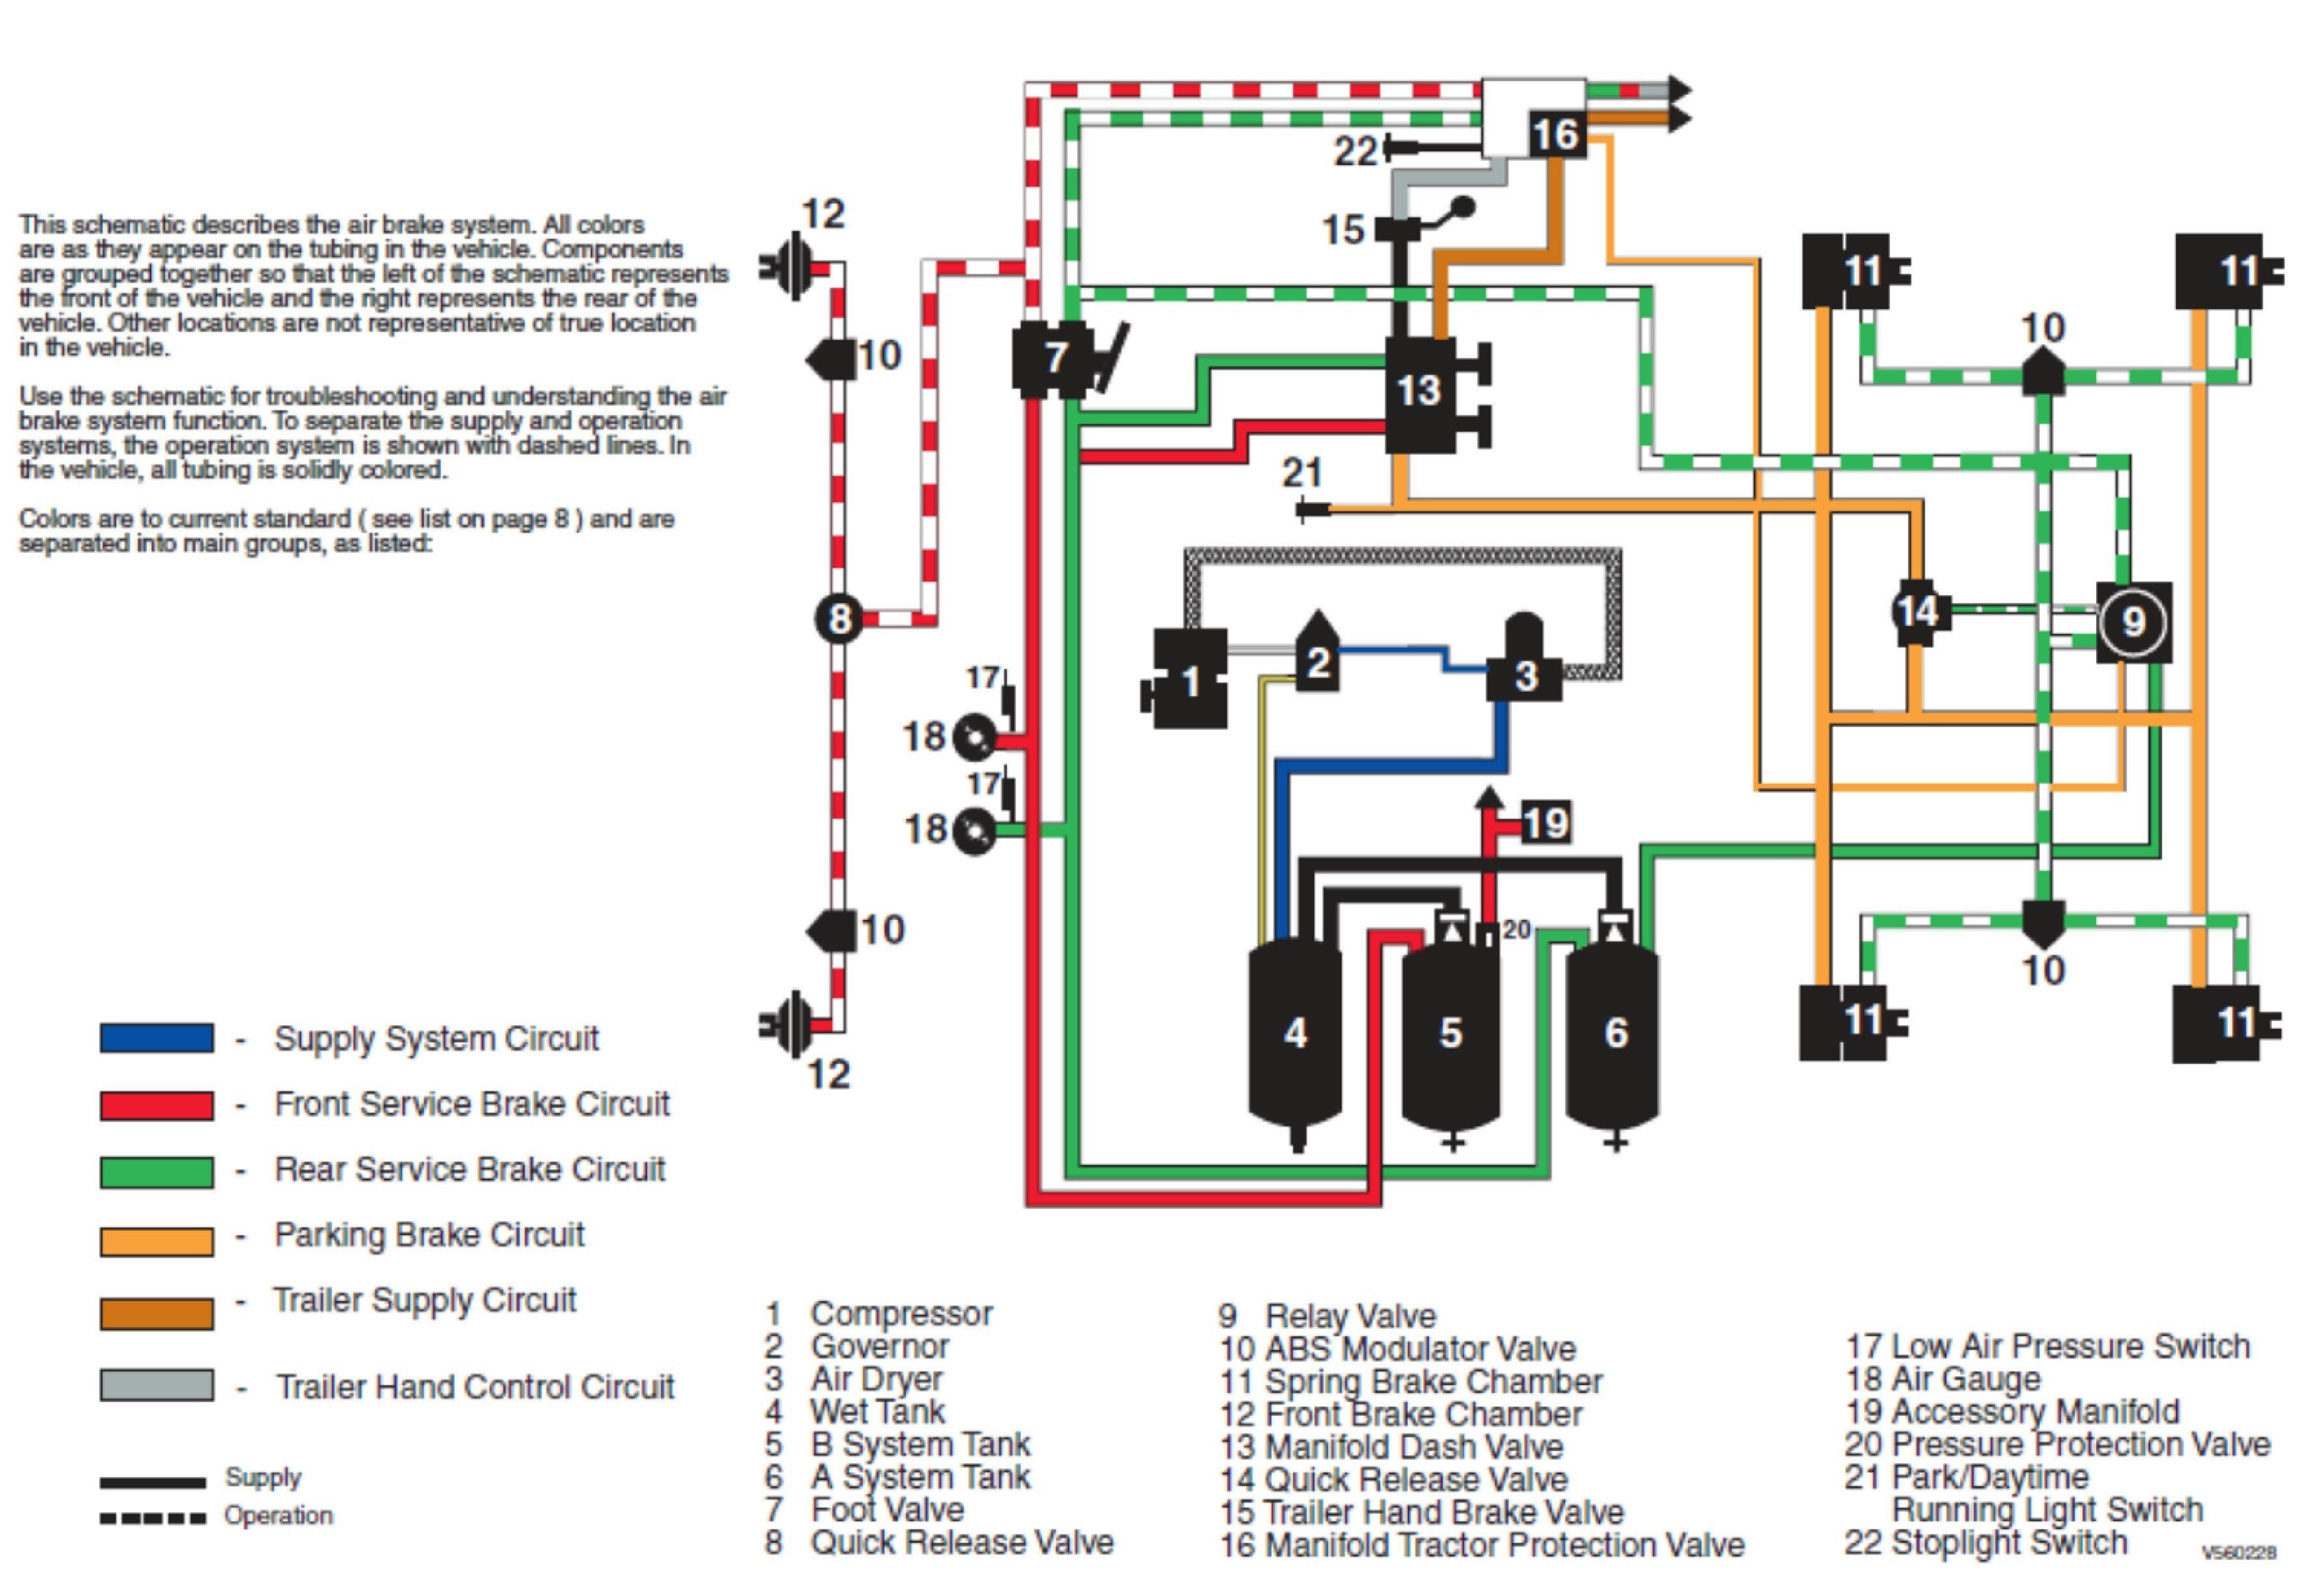 Peterbilt Air Brake Diagram Archer tower Printable Diagram source